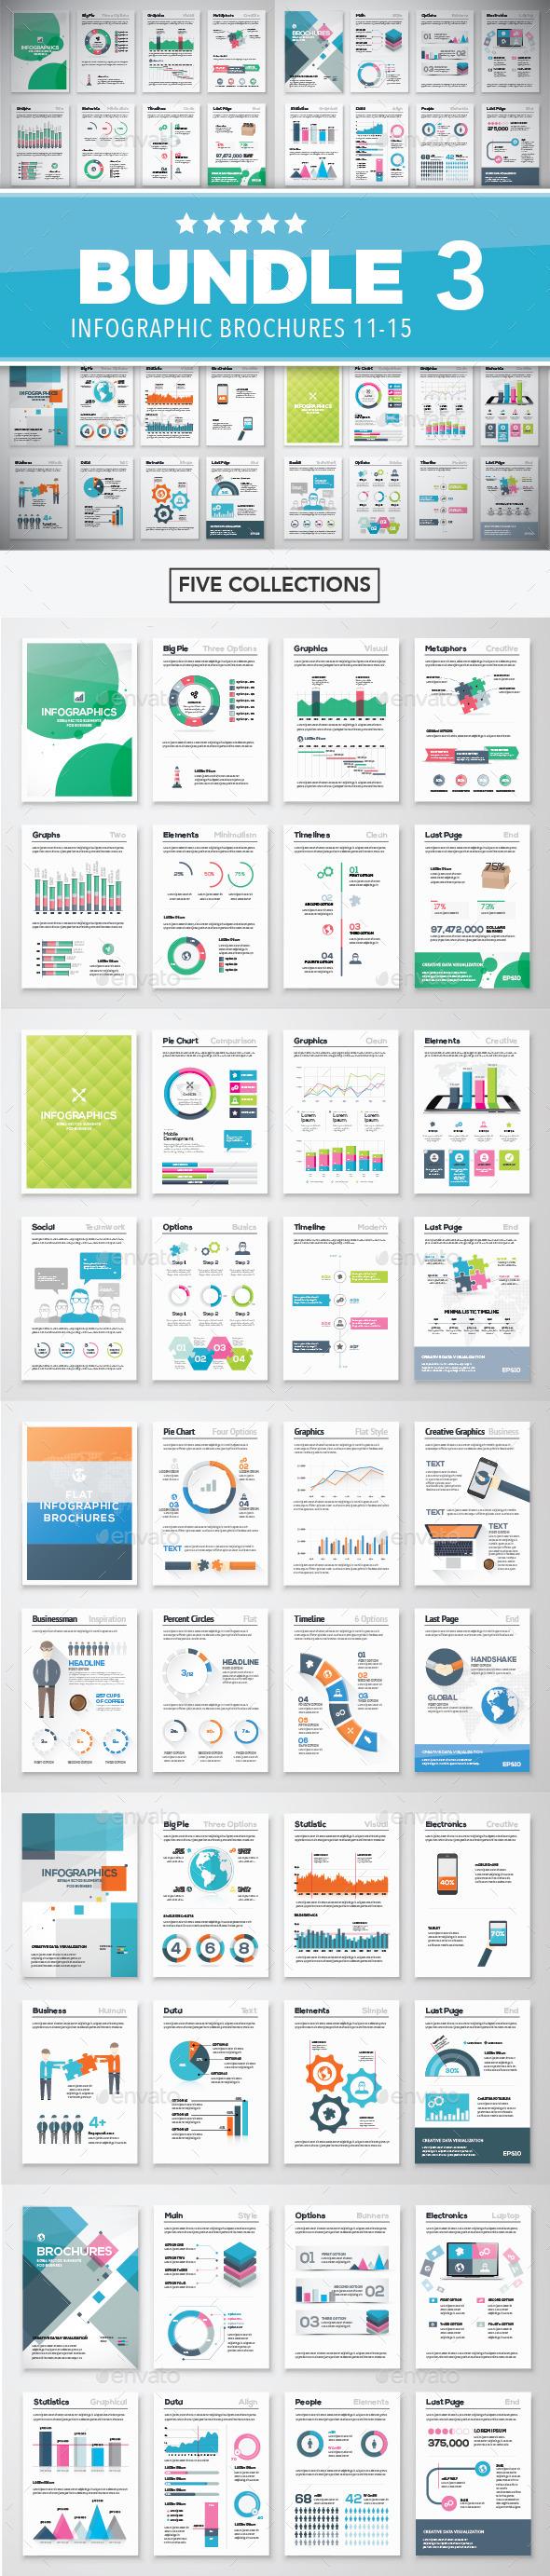 Infographic Brochure Elements Bundle 3